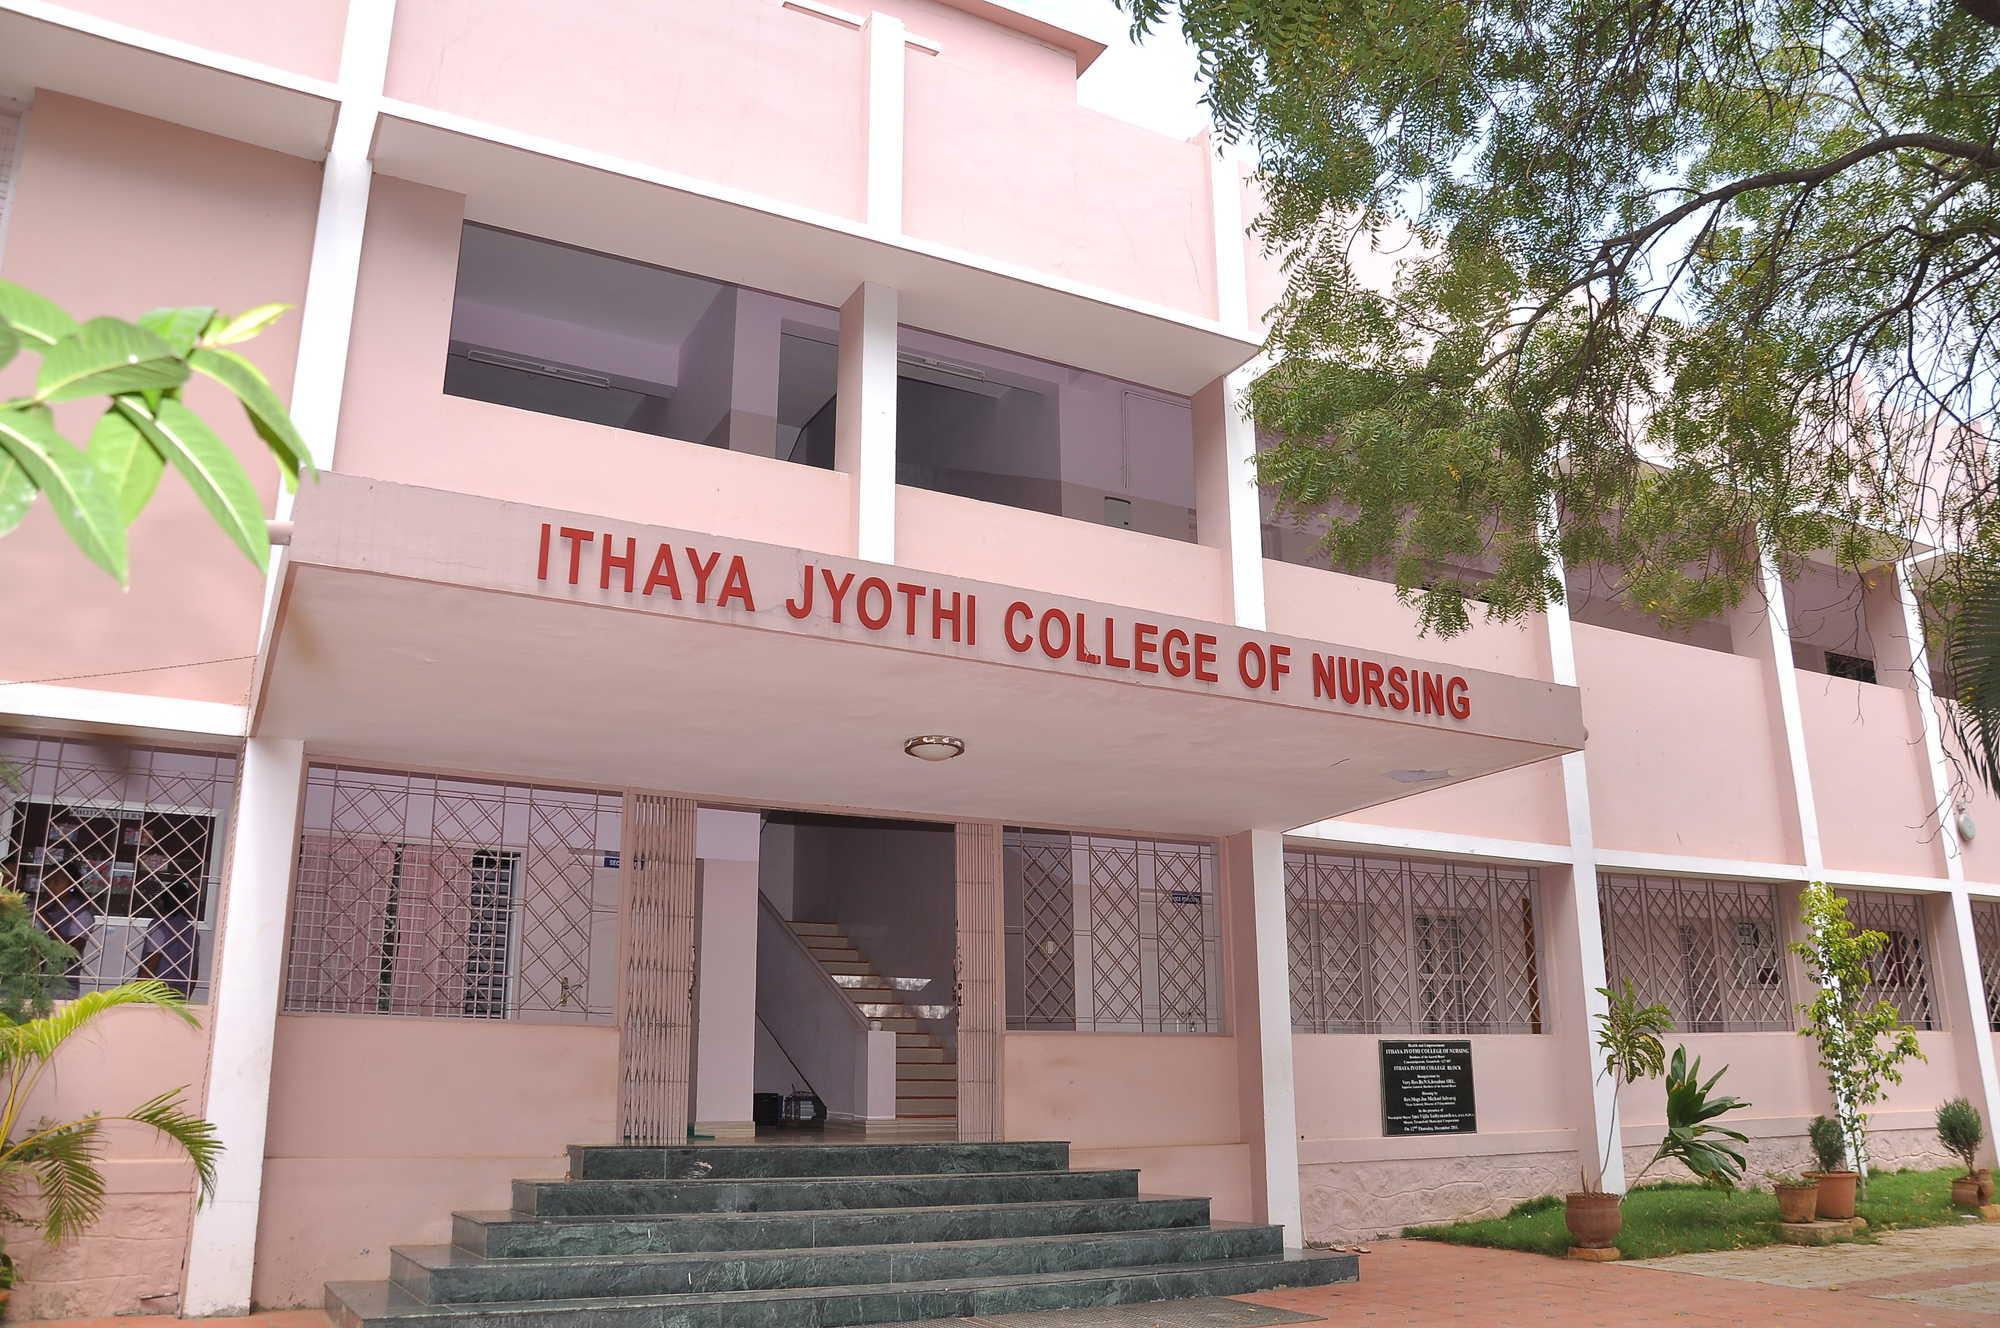 Ithaya Jyothi College of Nursing, Tirunelveli